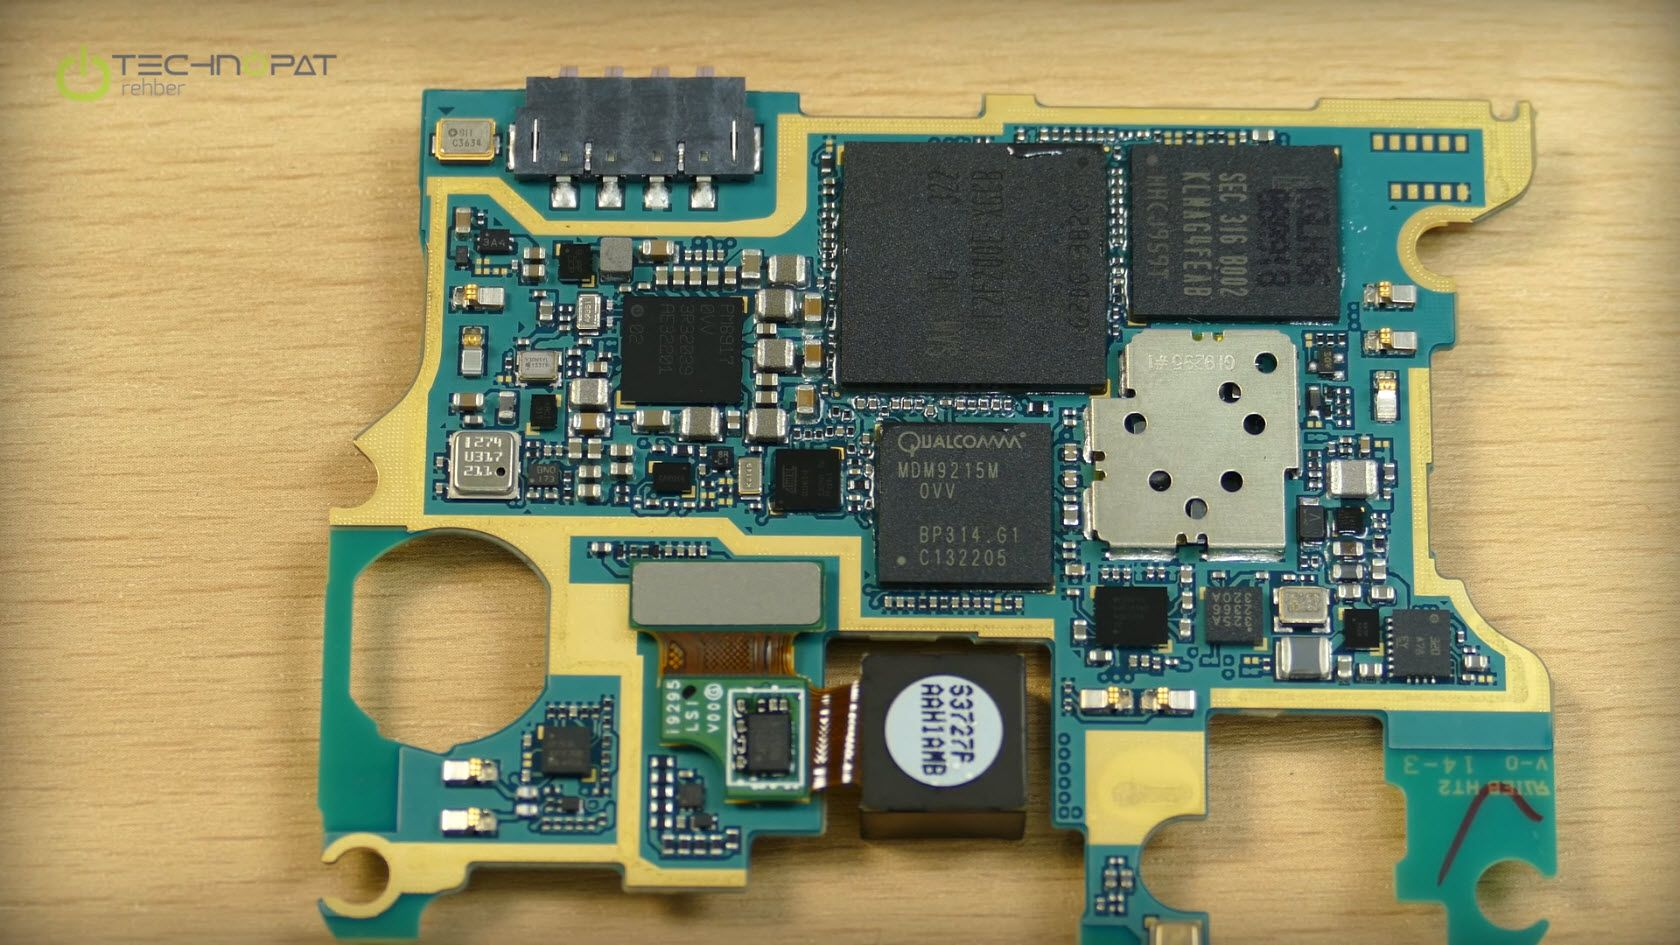 Qualcomm SoC - System on Chip karşımızda